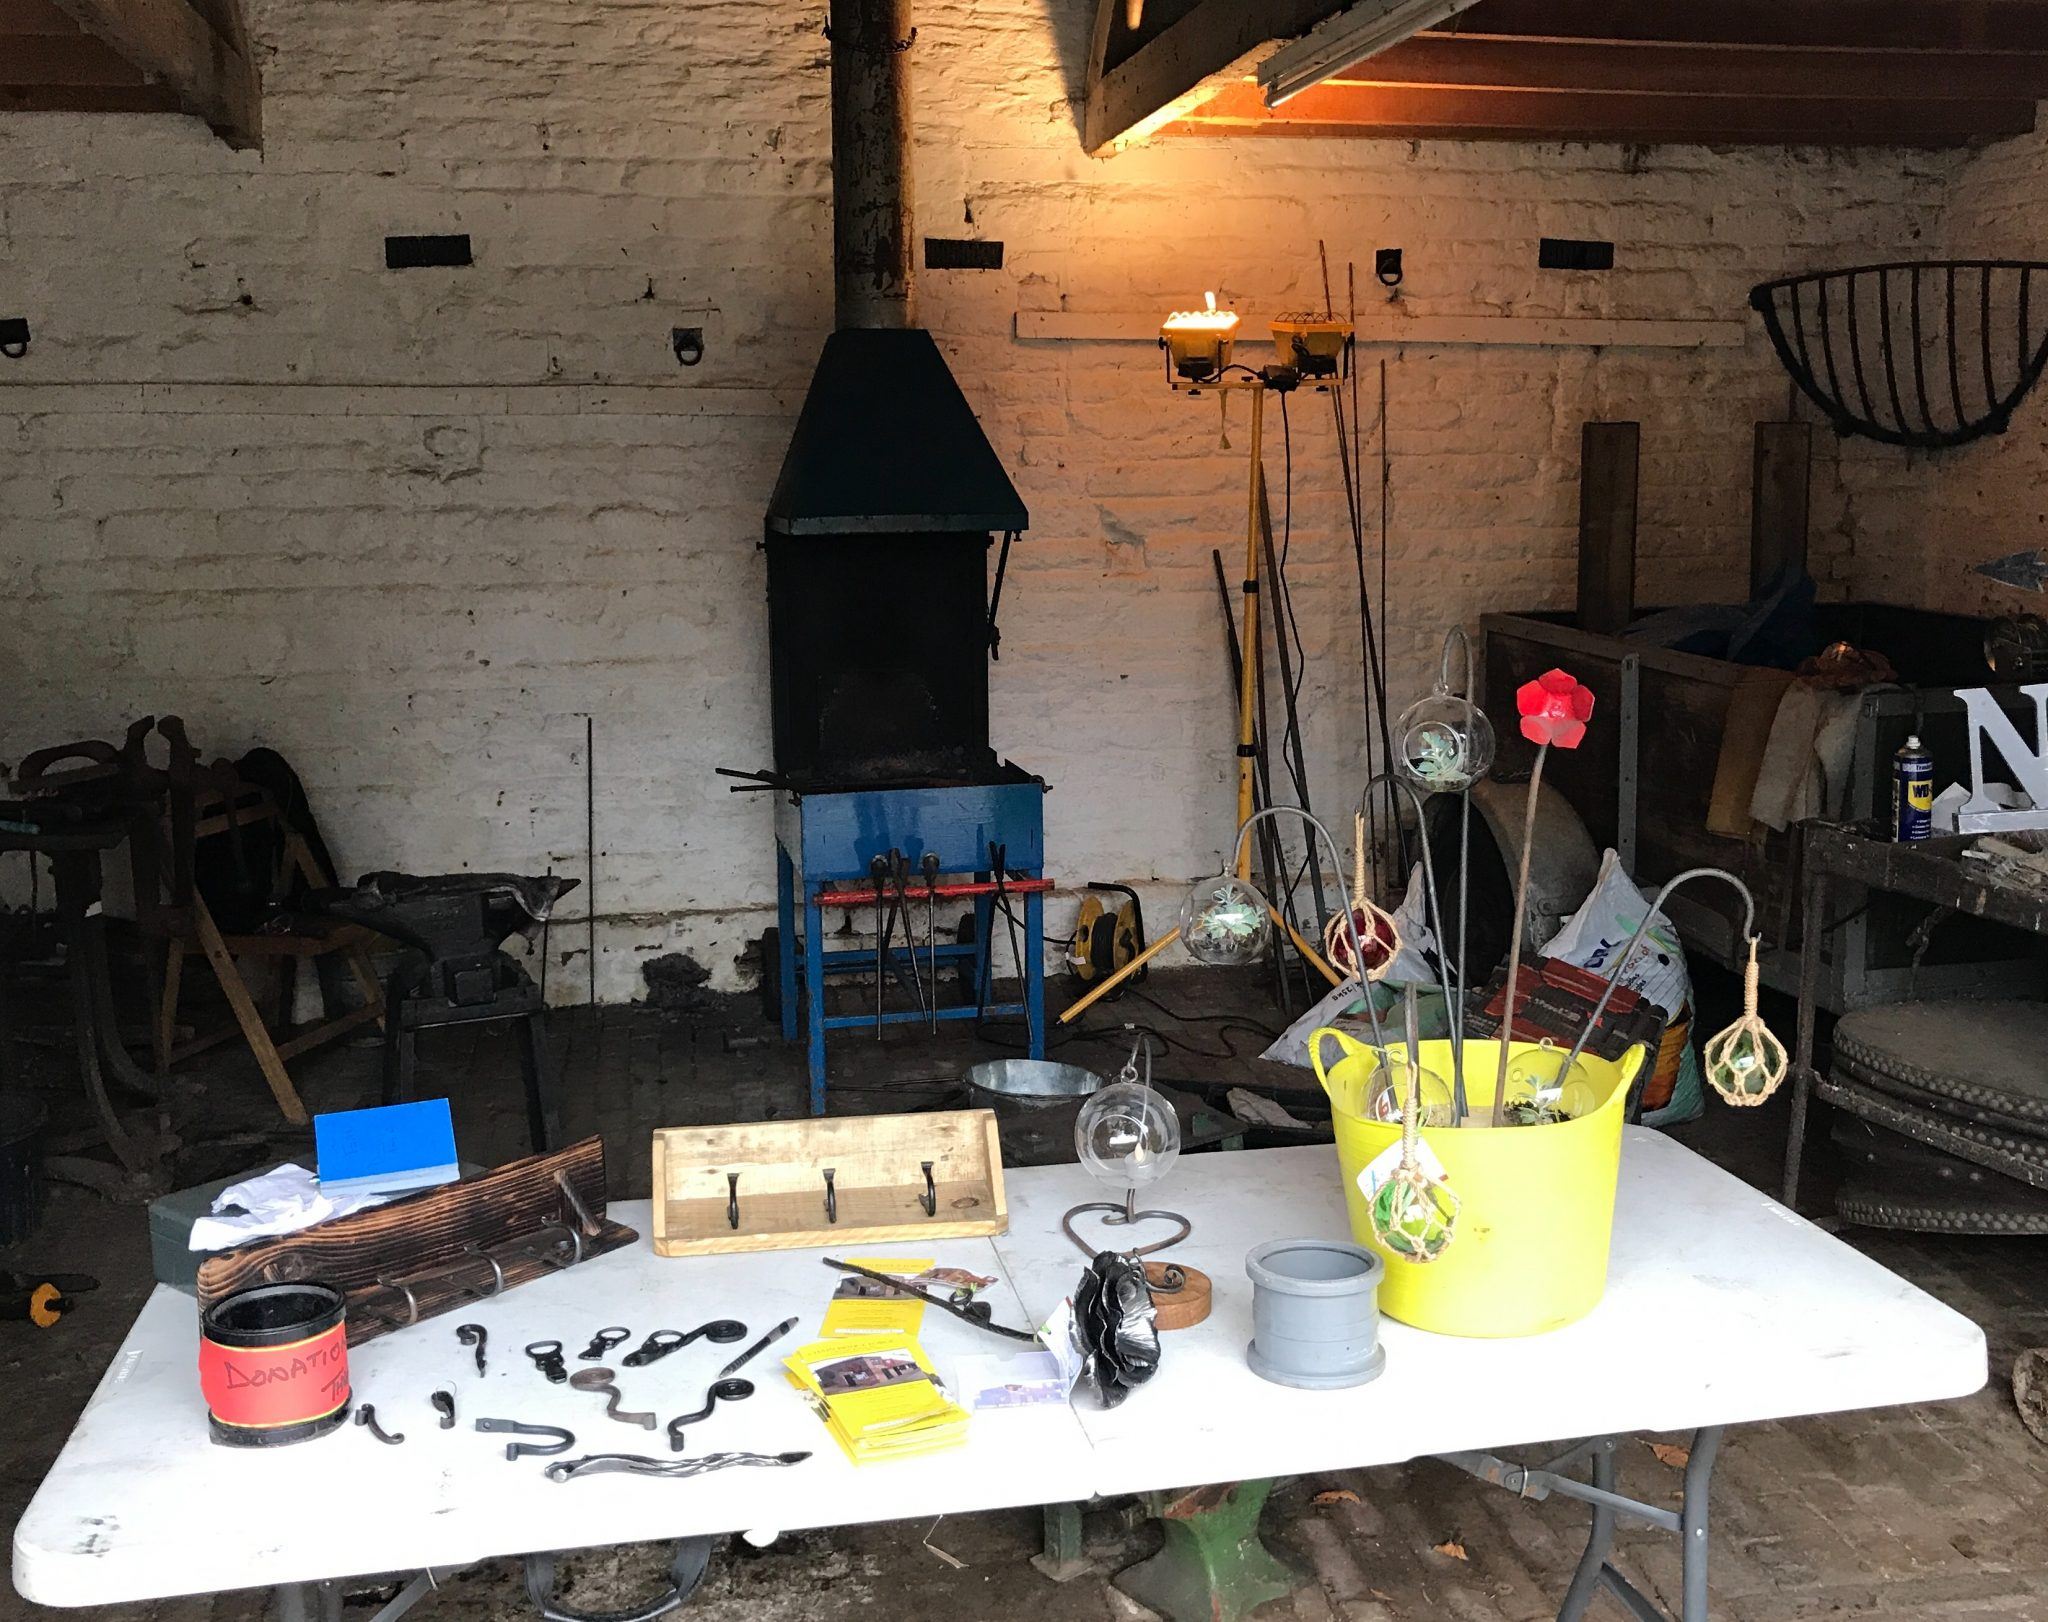 Blacksmithing at Sacrewell Farm, Peterborough